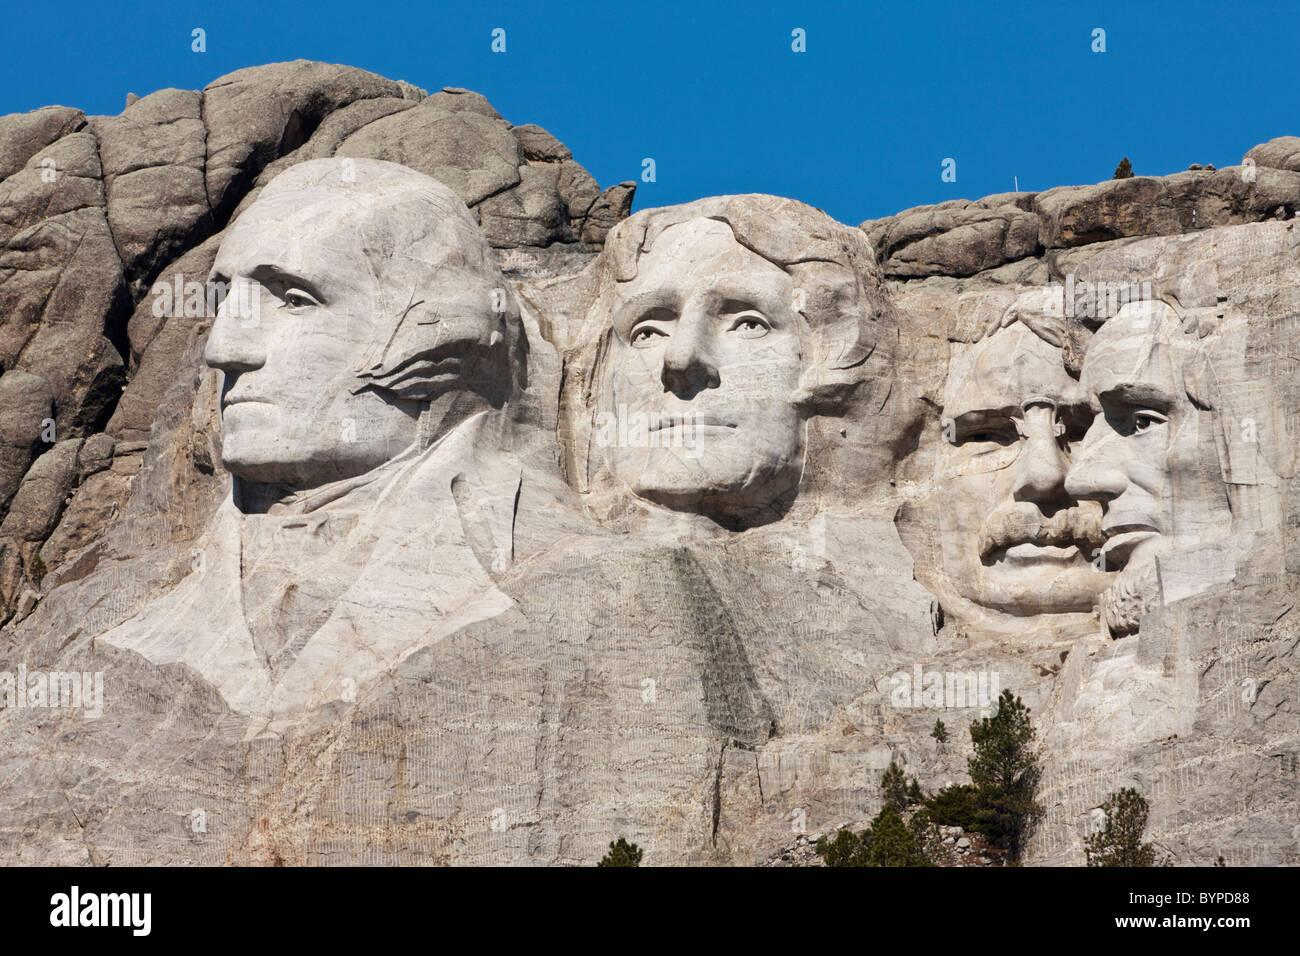 Usa South Dakota Mount Rushmore National Monument Faces